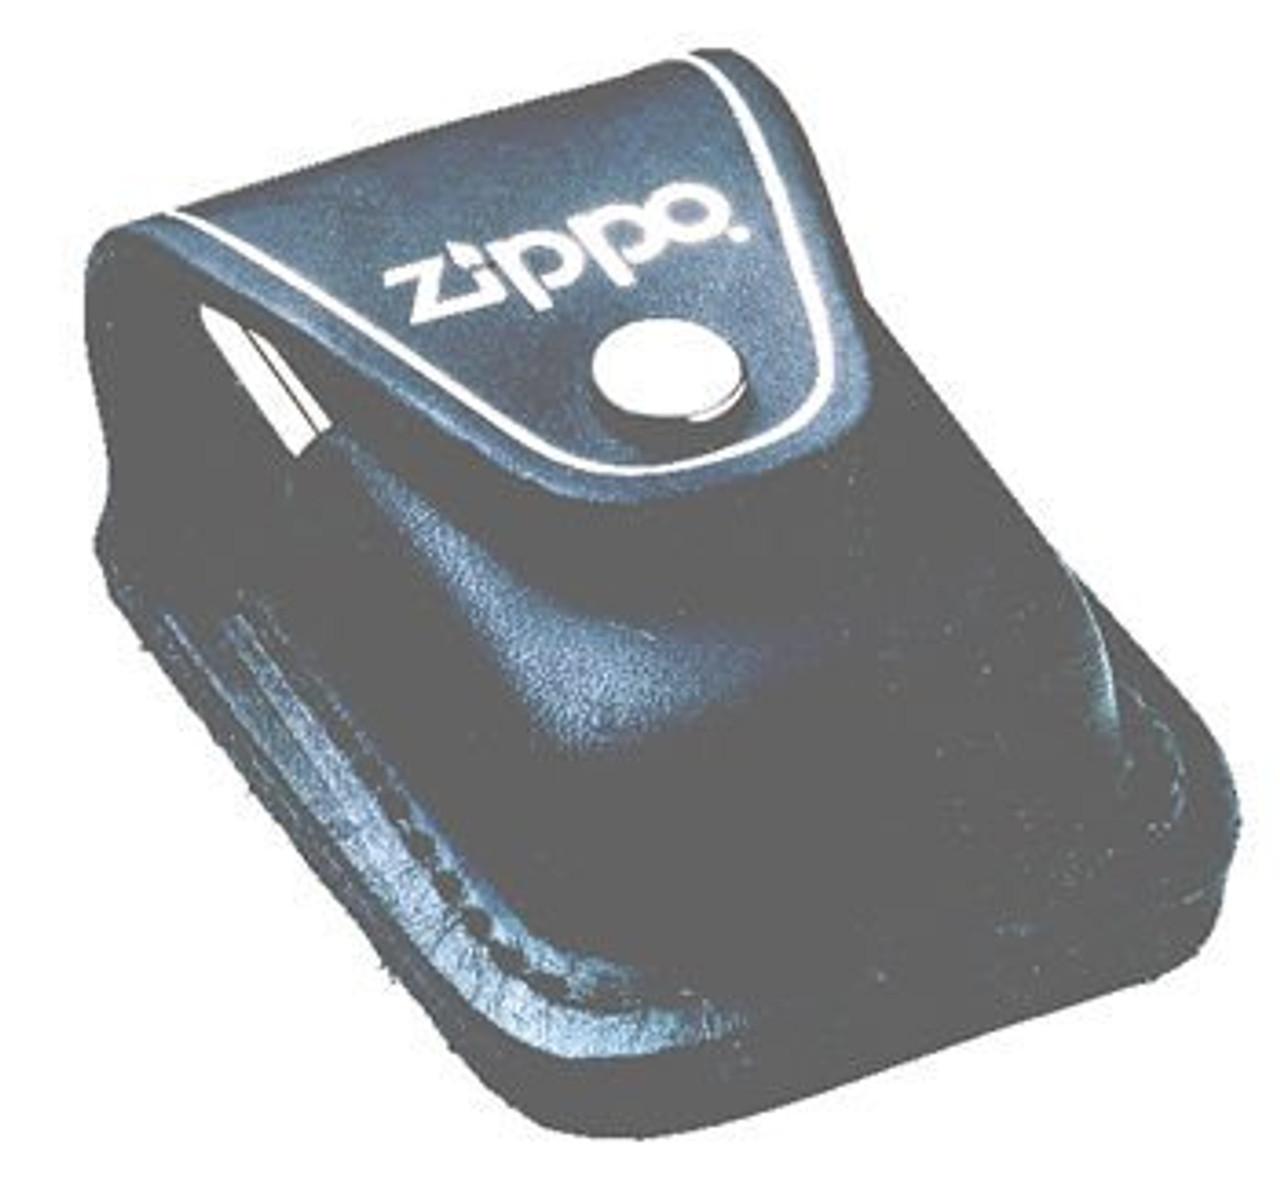 Zippo ZLPLBK Black Leather Lighter Pouch with Belt Loop